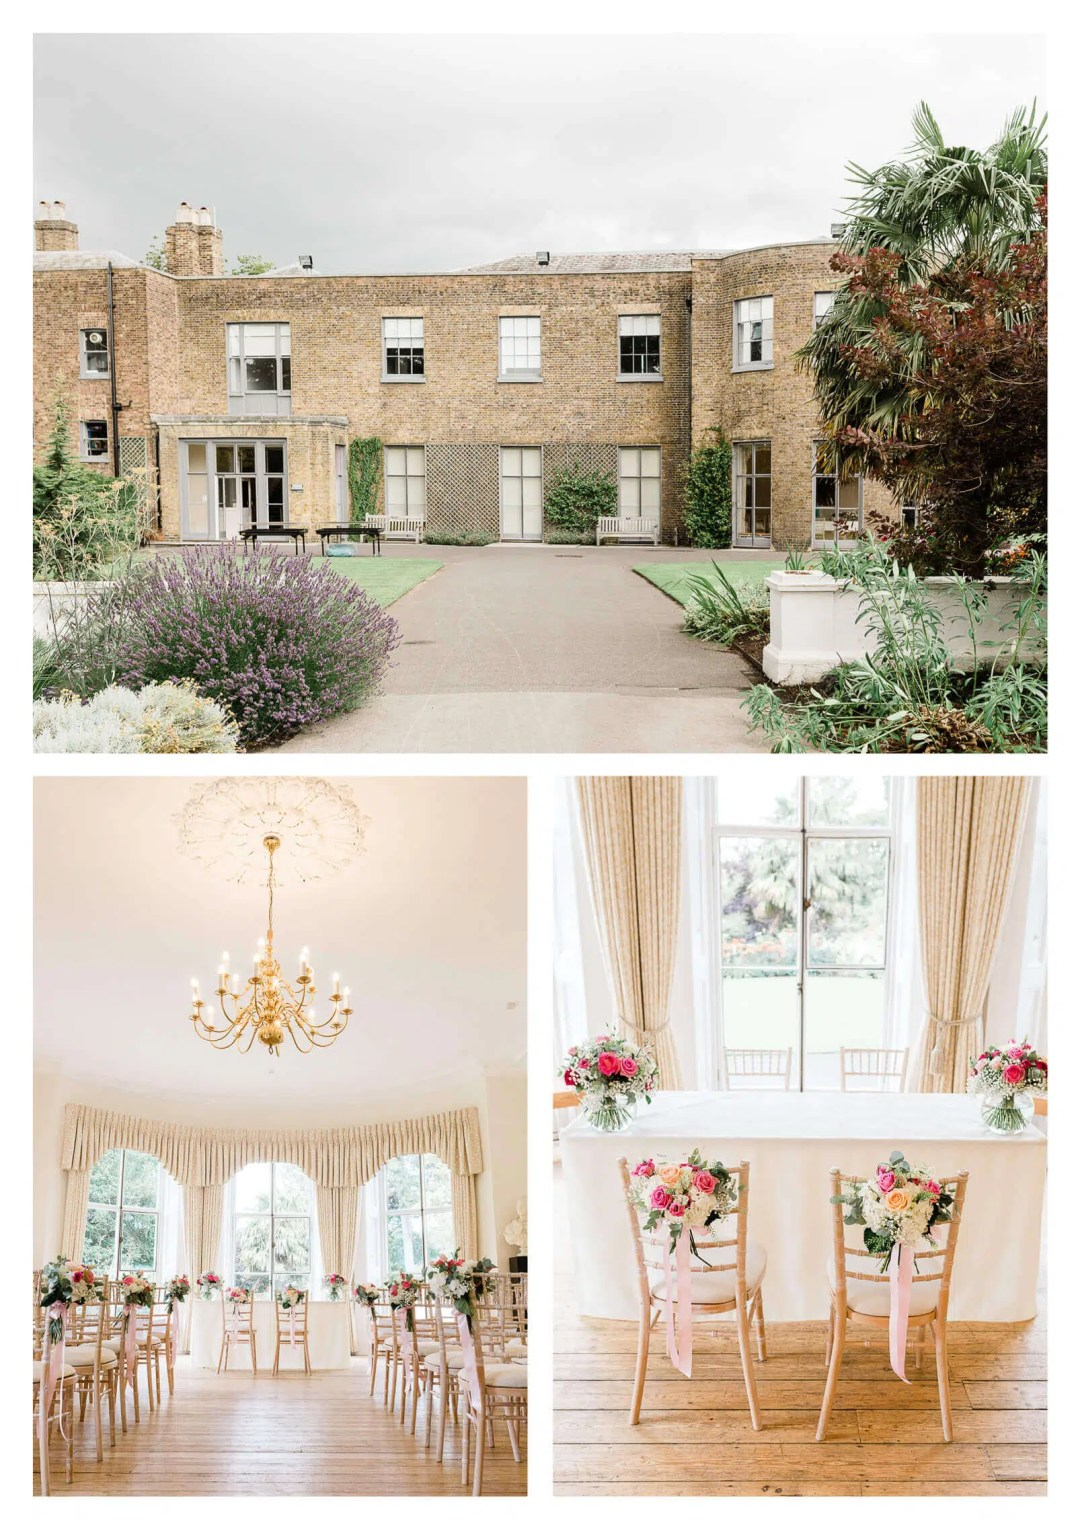 Cambridge Cottage wedding ceremony decor | Kew Gardens wedding photographer